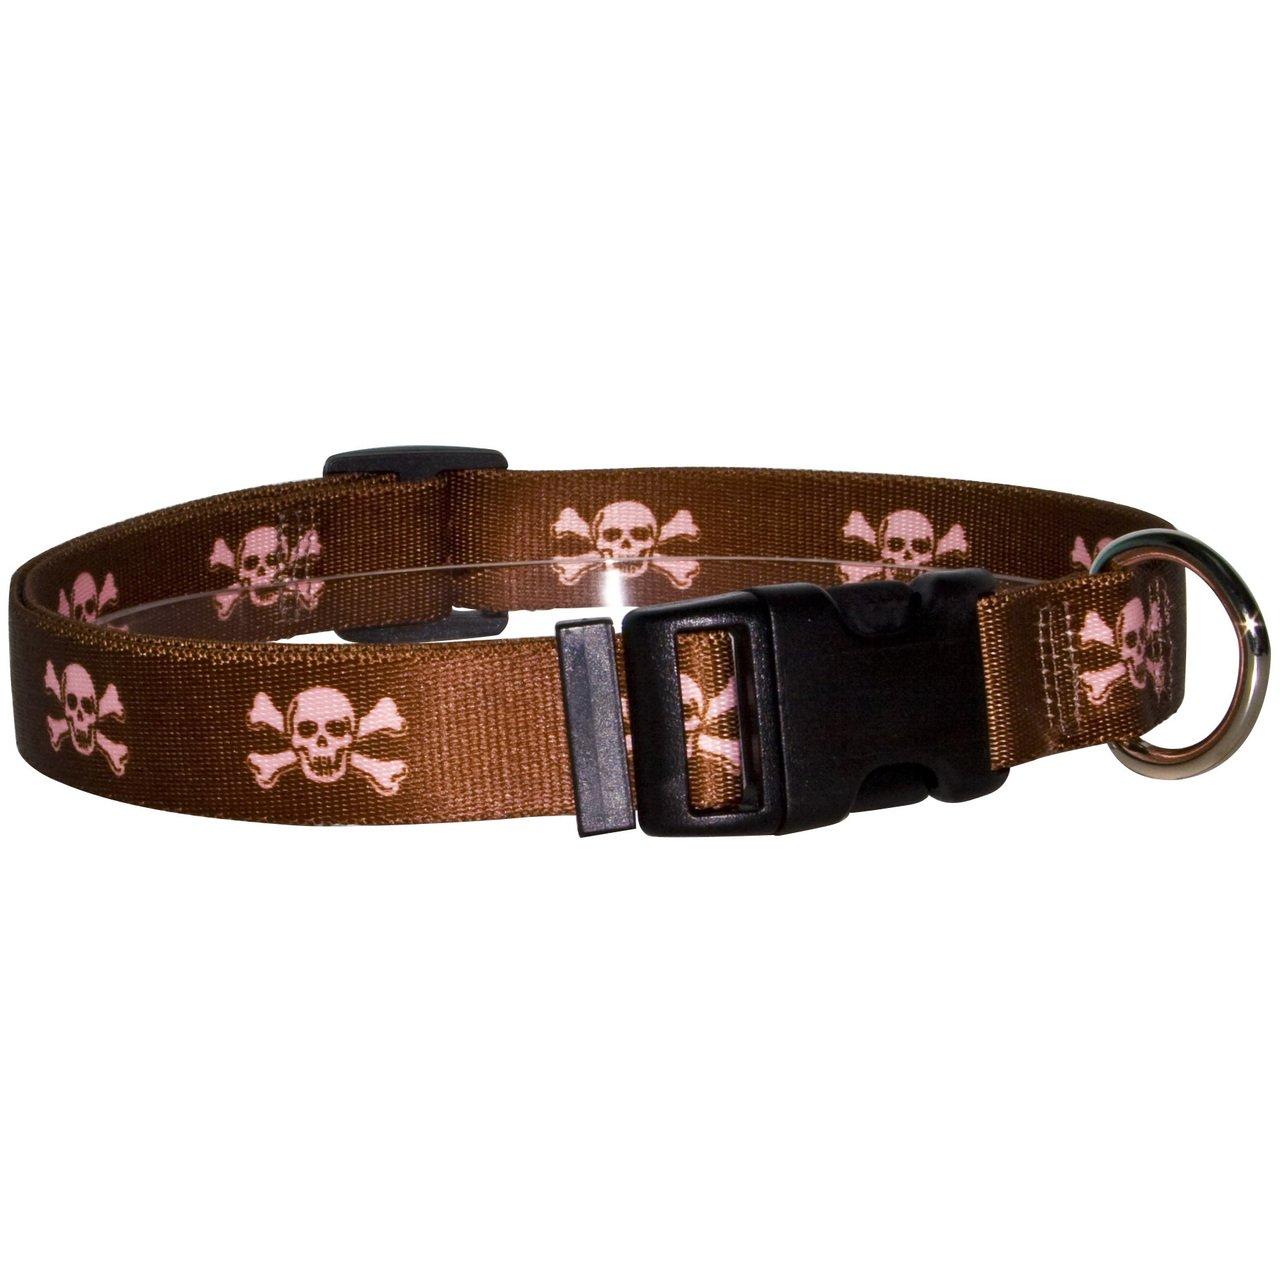 Yellow Dog Design Standard Easy-Snap Collar